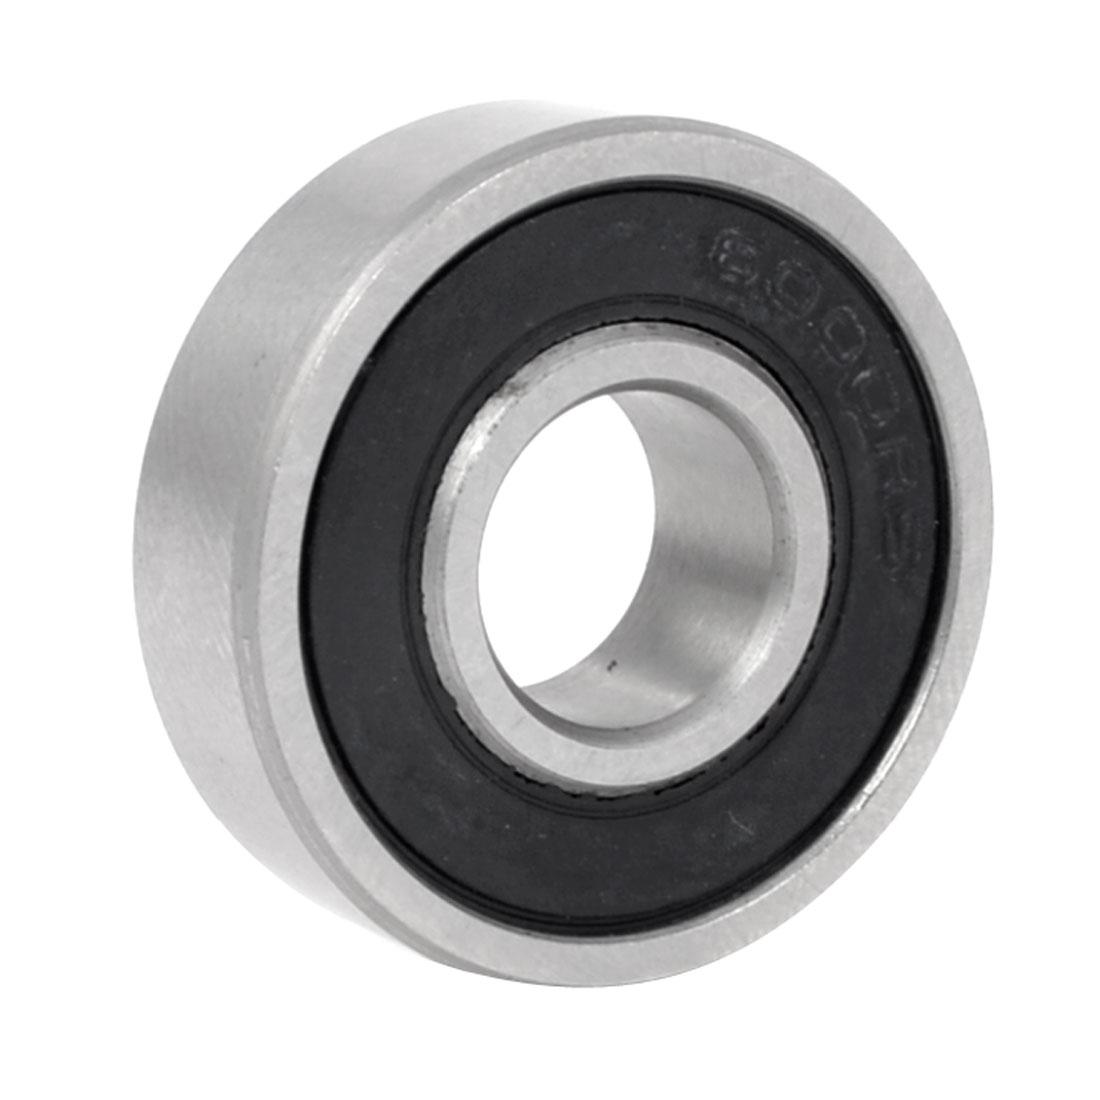 10mm x 26mm x 8mm Skating Deep Groove Ball Wheel Bearing